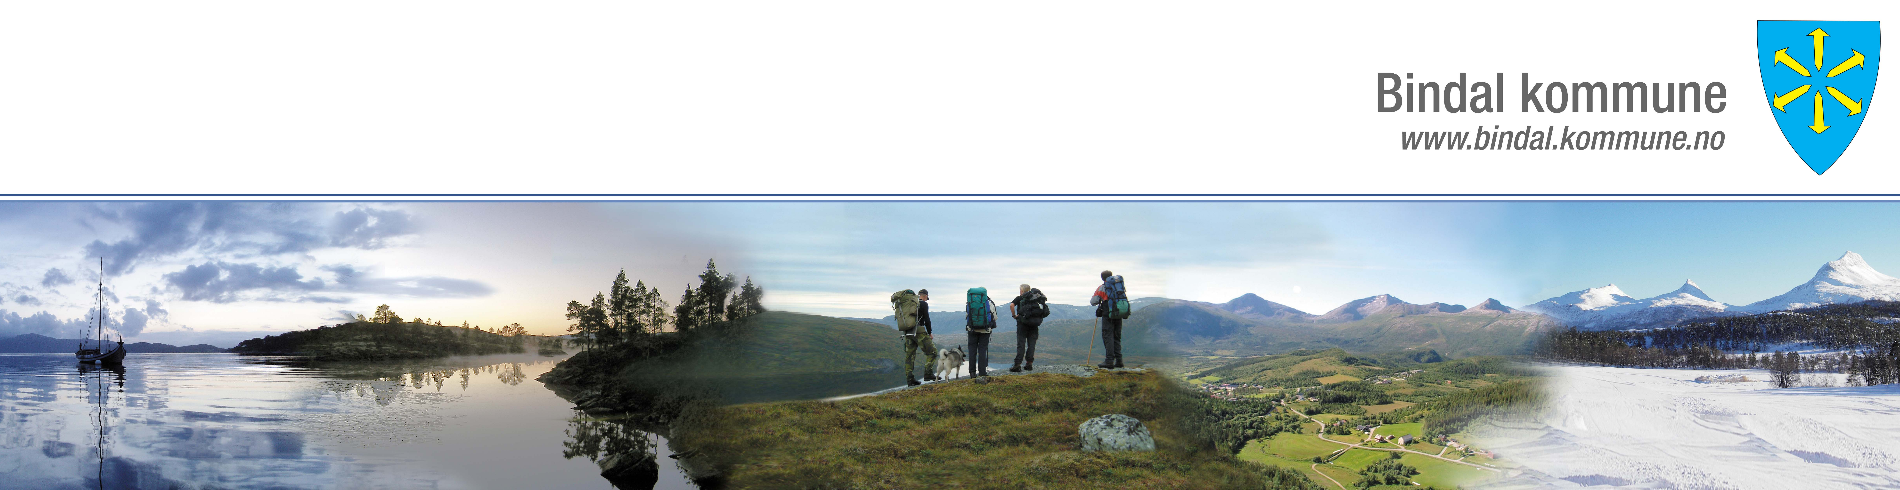 Bindal kommune cover image